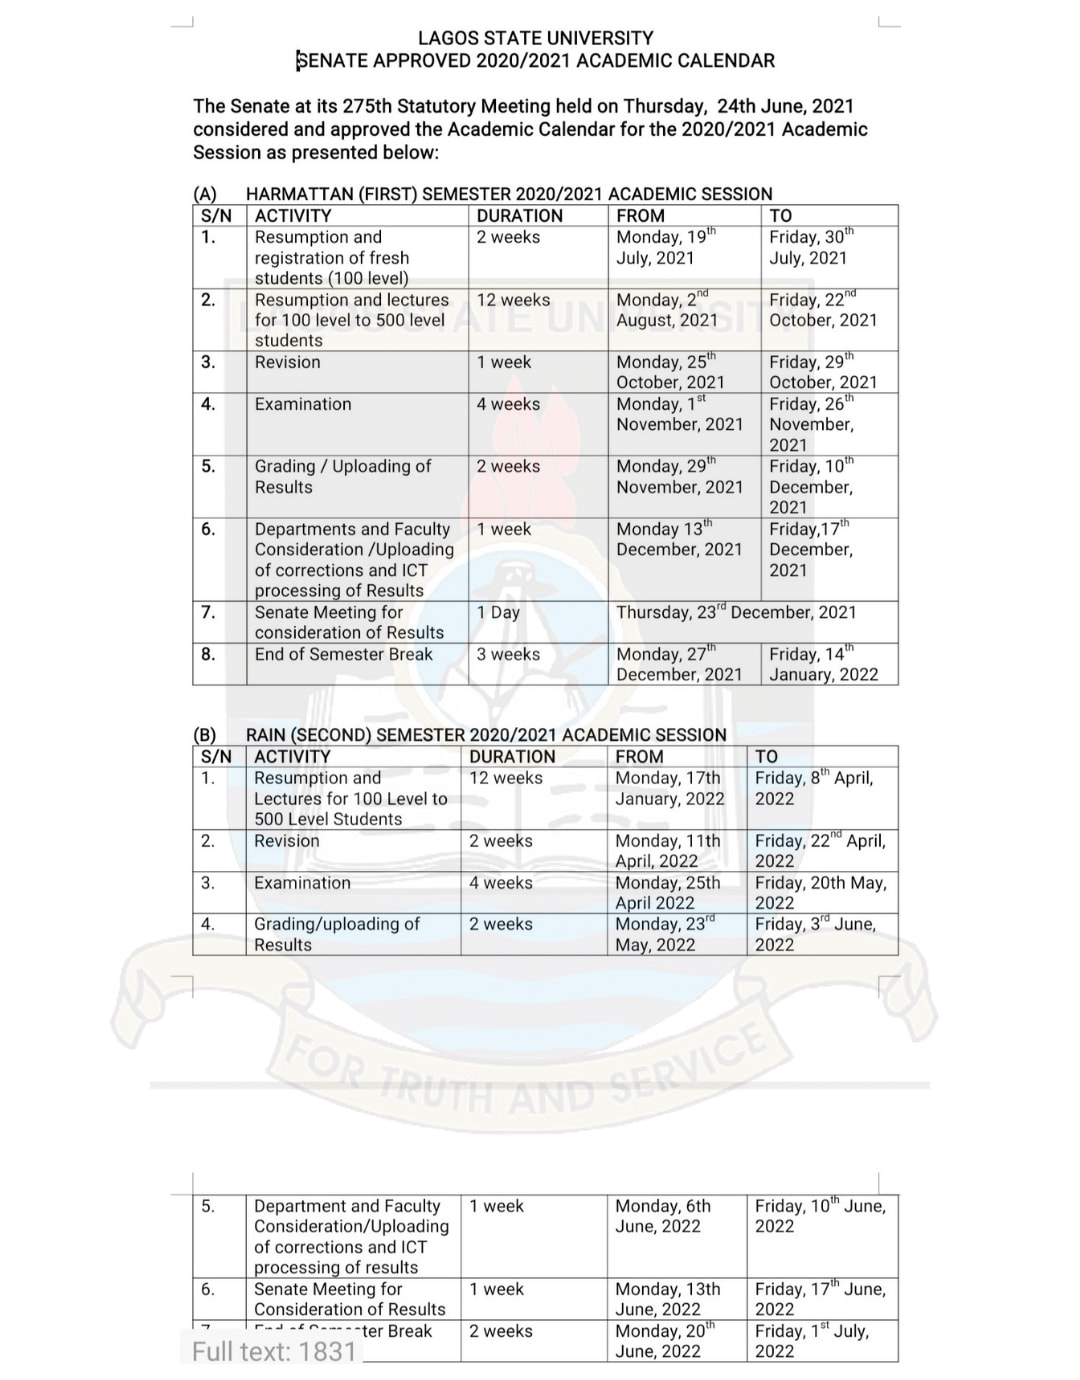 LASU Academic Calendar Schedule 2020/2021 [APPROVED]